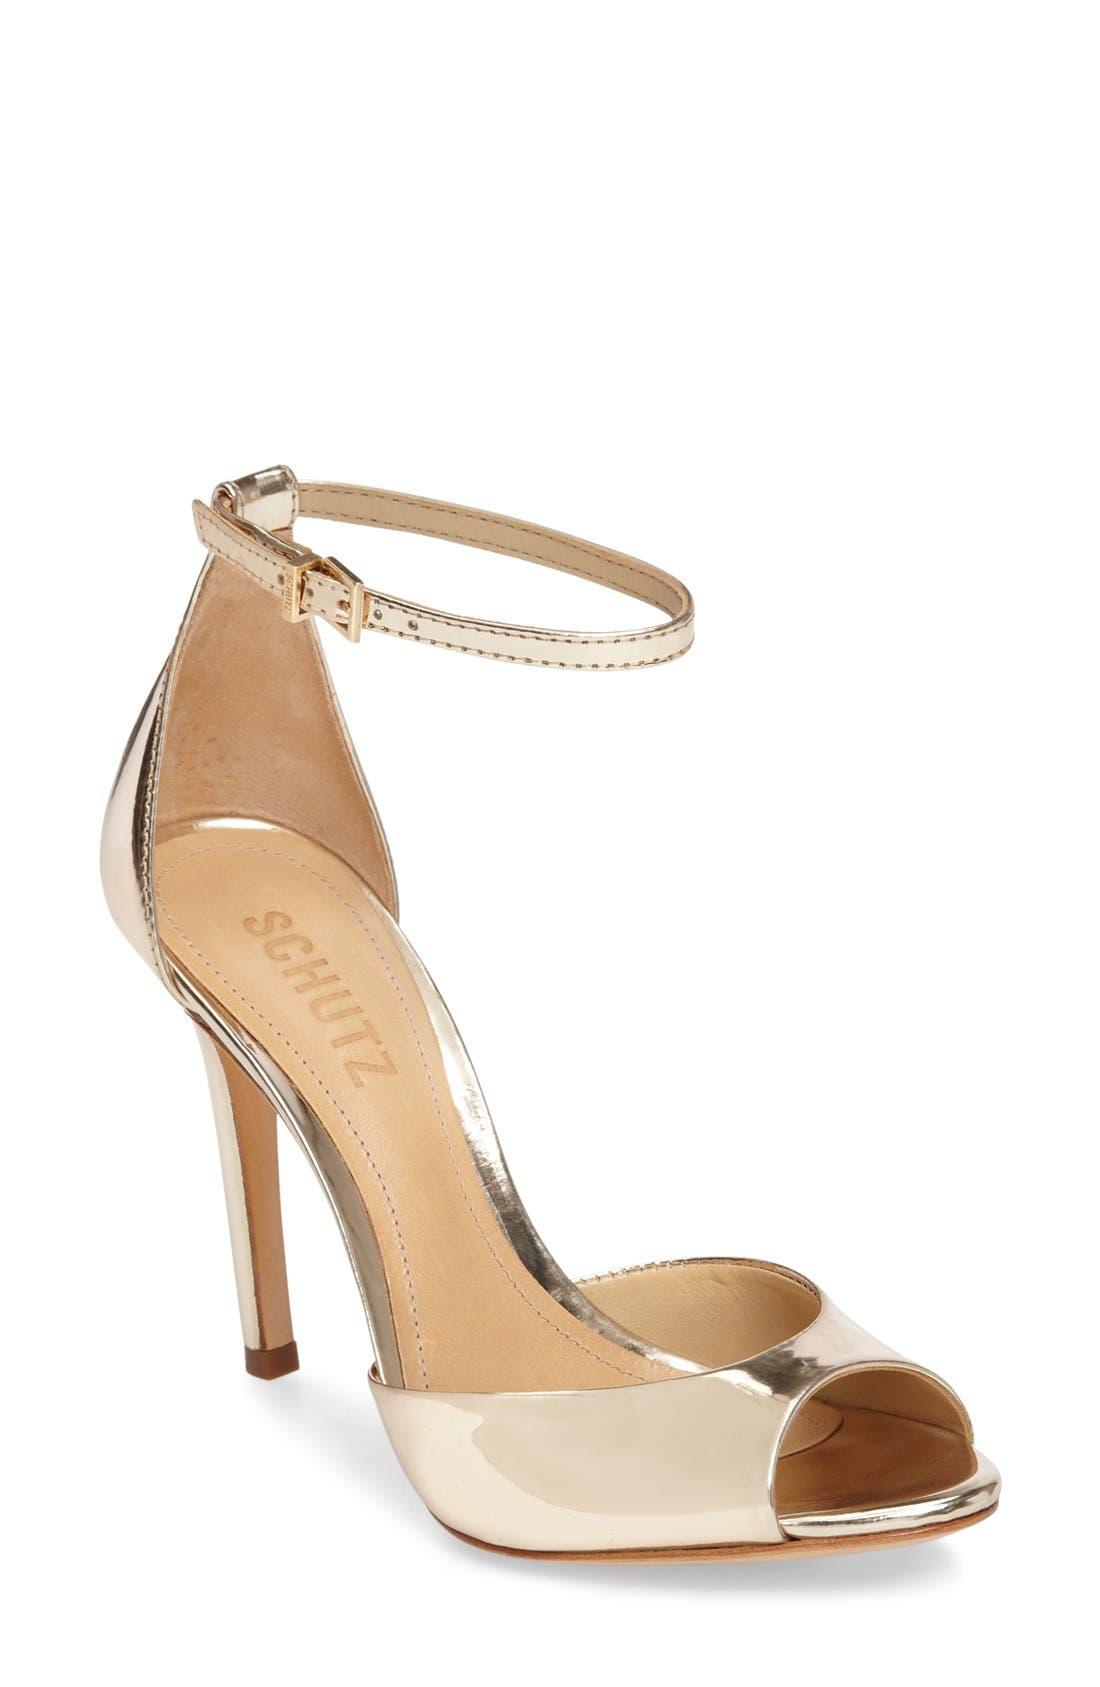 Main Image - Schutz Saasha Lee Ankle Strap Sandal (Women)